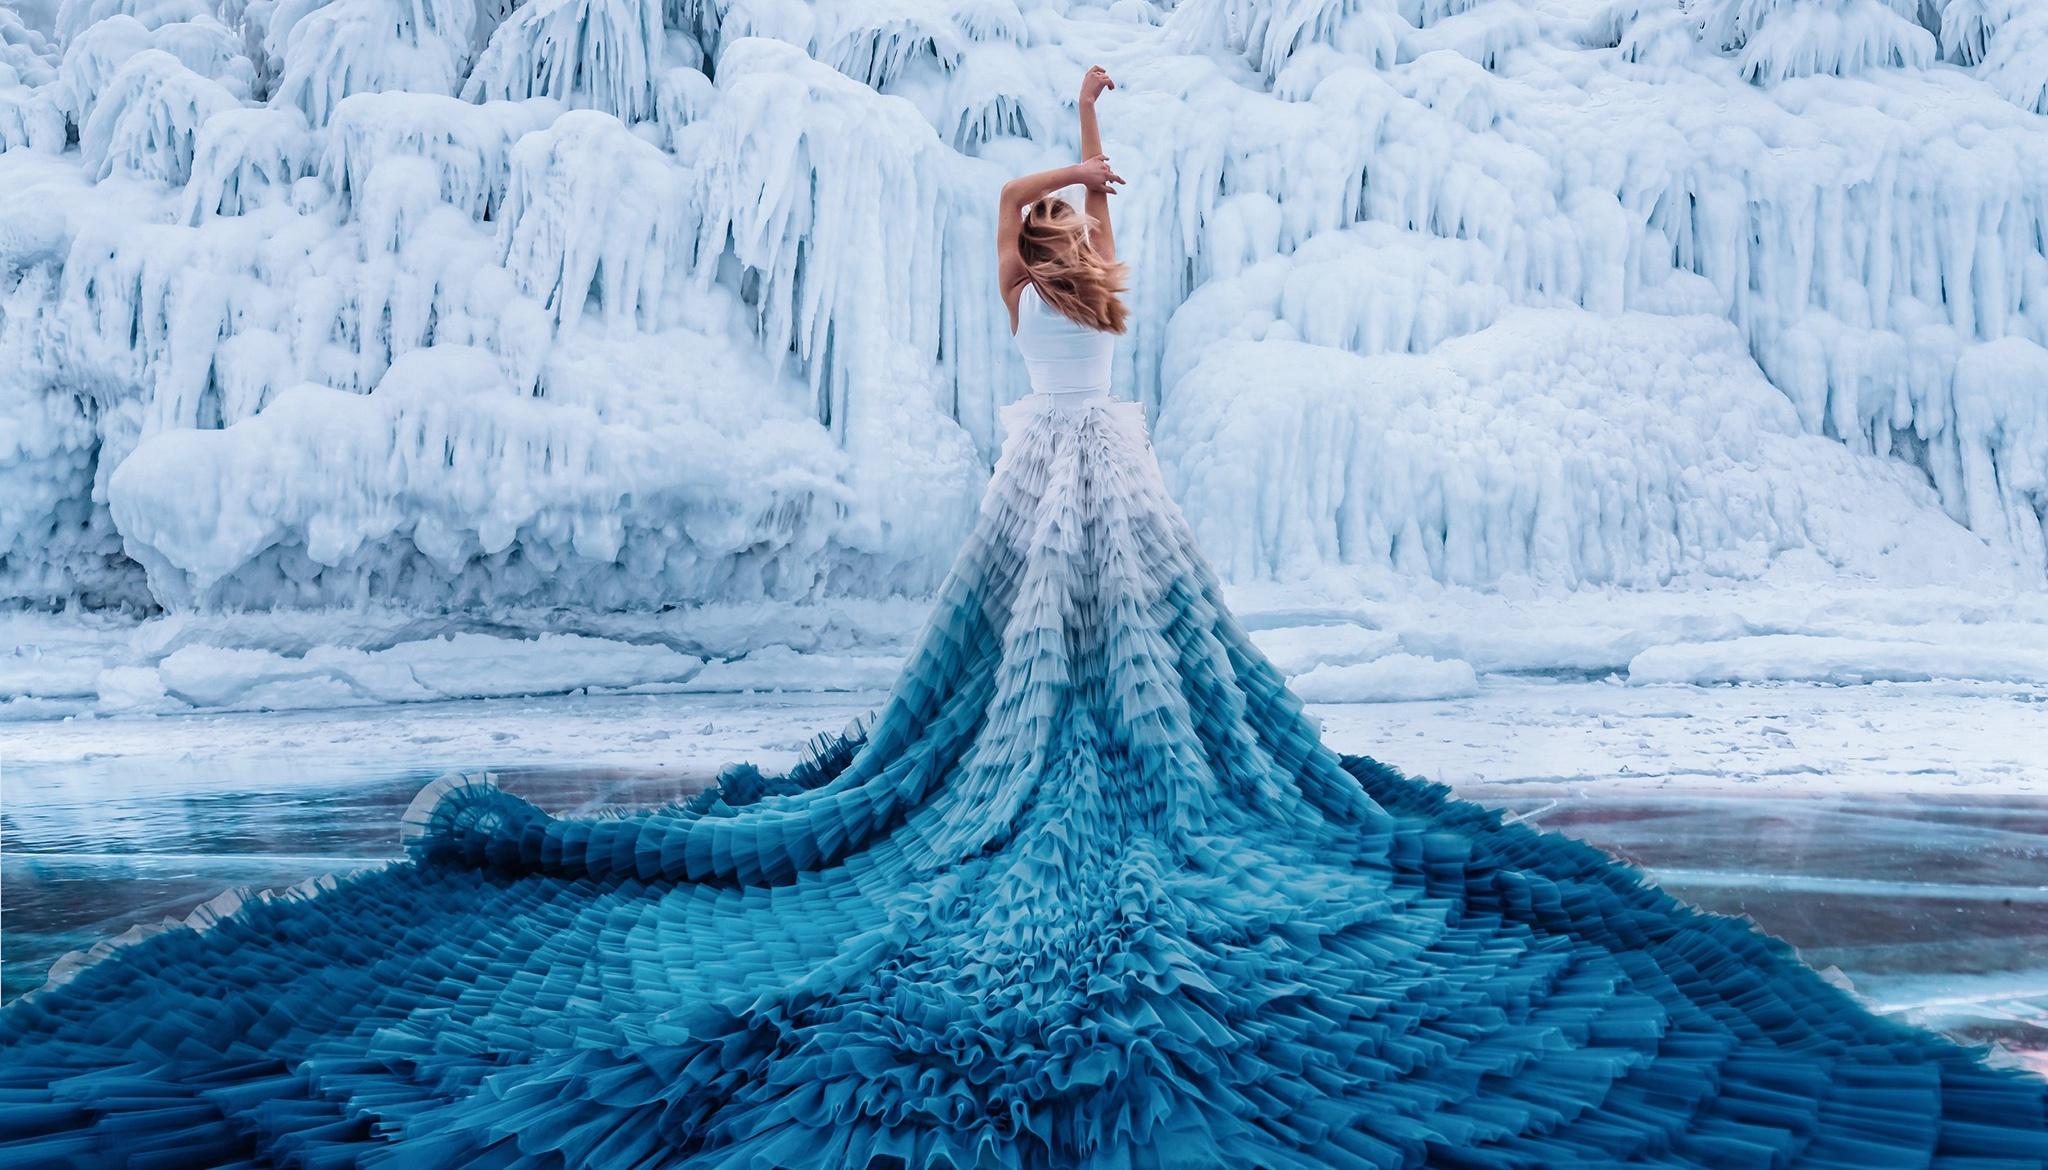 People 2048x1170 dress cold ice women model women outdoors arms up Kristina Makeeva Elizaveta Ovcharenko